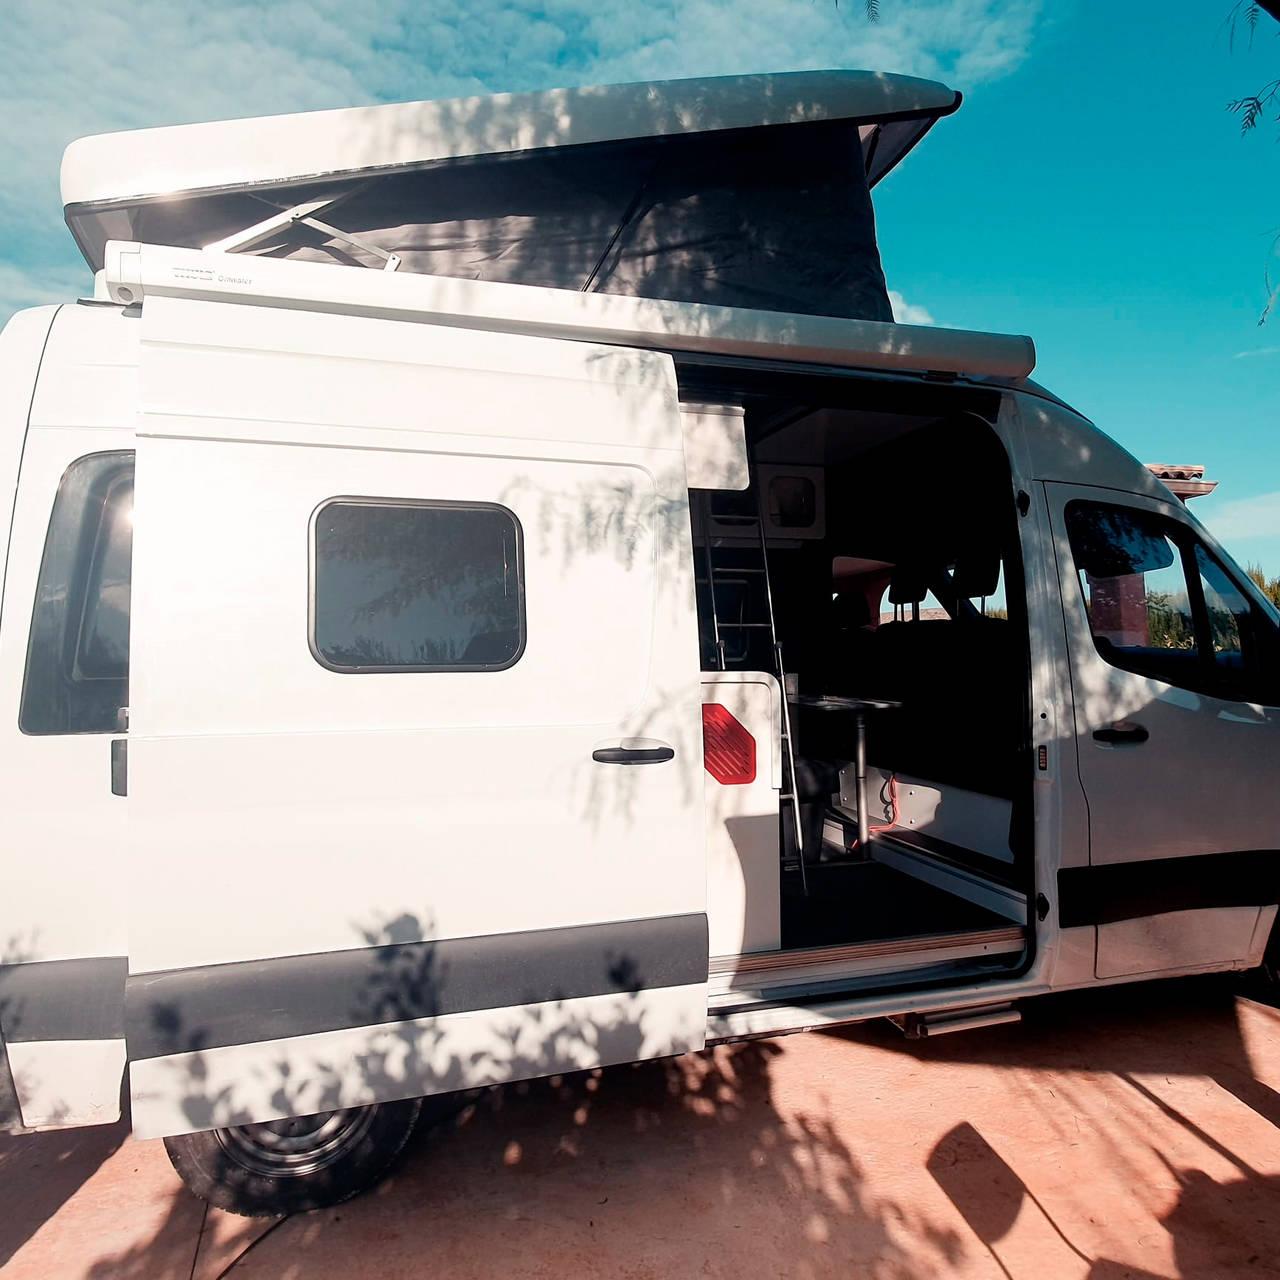 Alquiler furgoneta Camper en Alicante Mercedes  - Foto 1